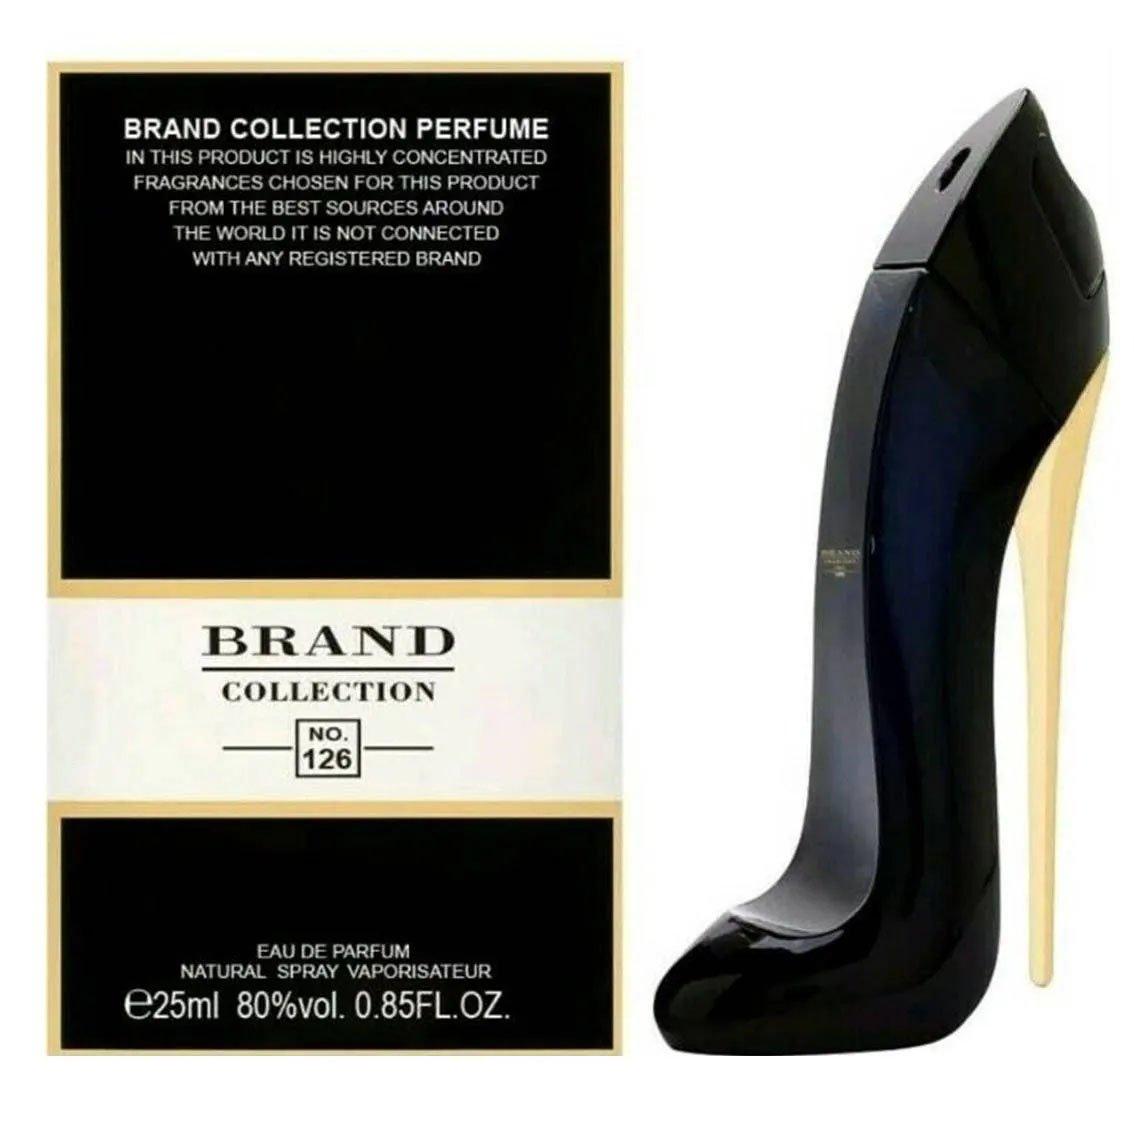 perfume brand collection 126 feminino 25 ml sapatinho tradicional 51253 2000 203633 1